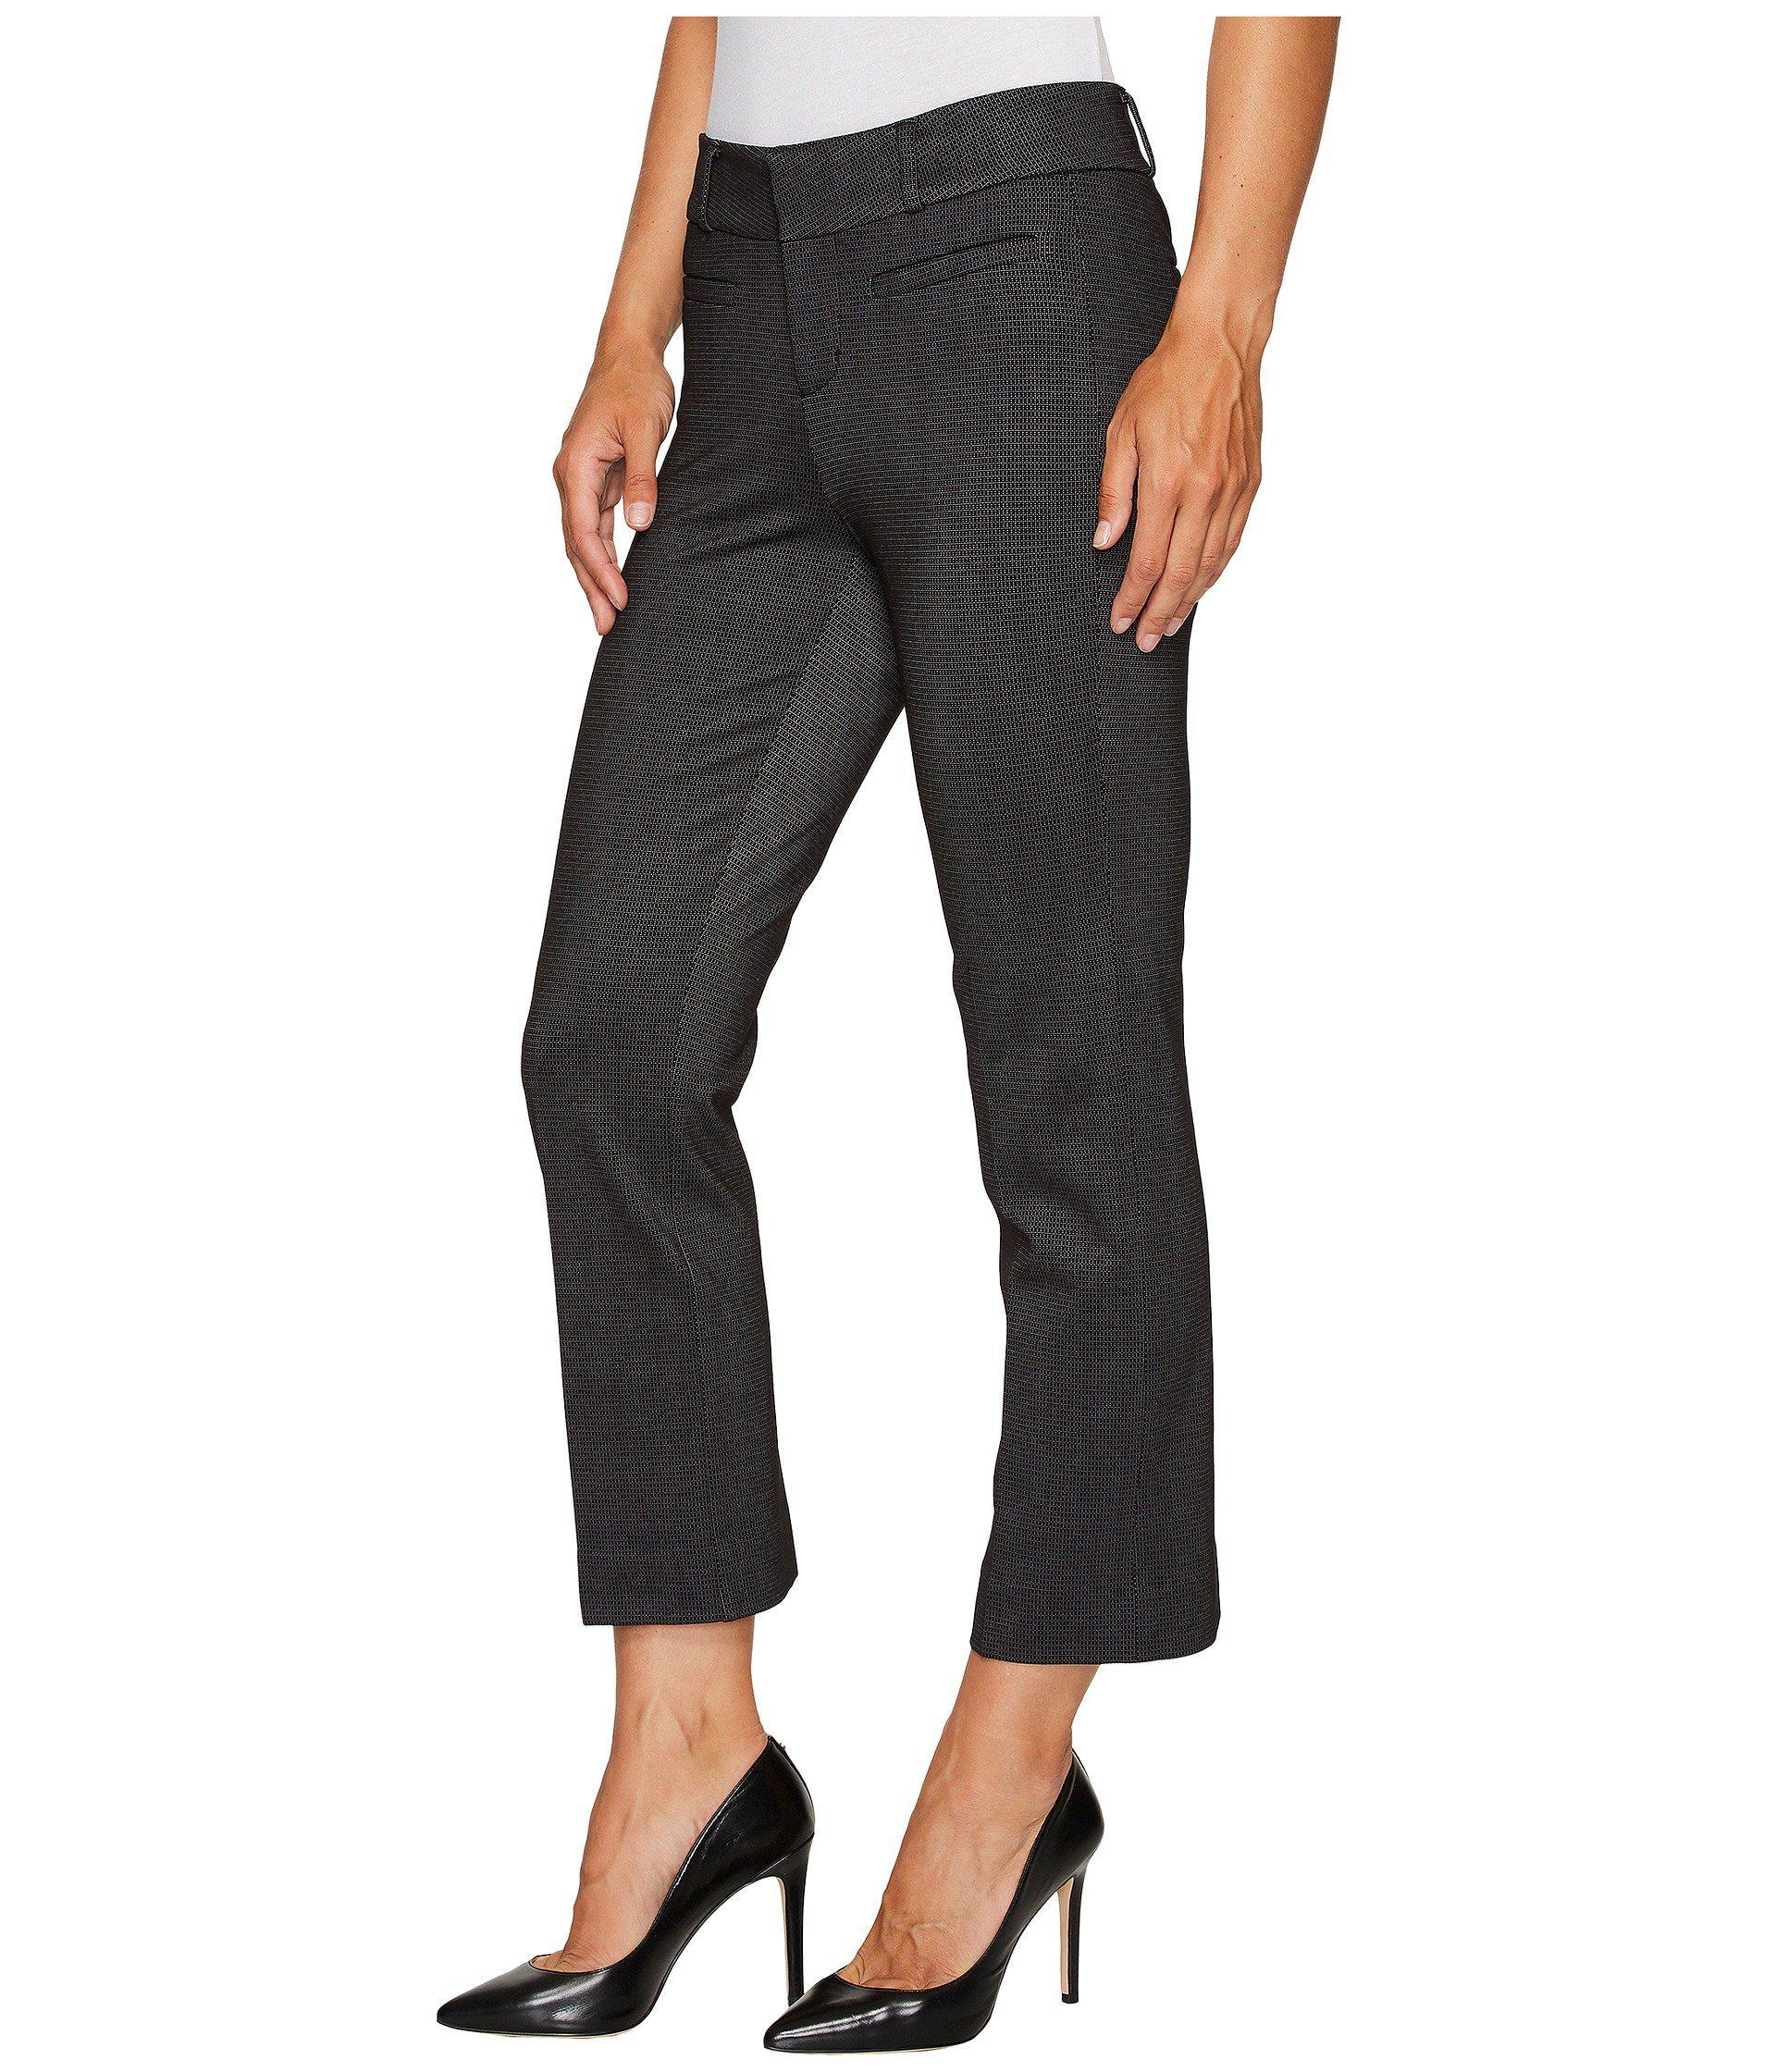 8263e4e42e3f6 Lyst - Liverpool Jeans Company Vera Crop Flare Trousers With Welt ...